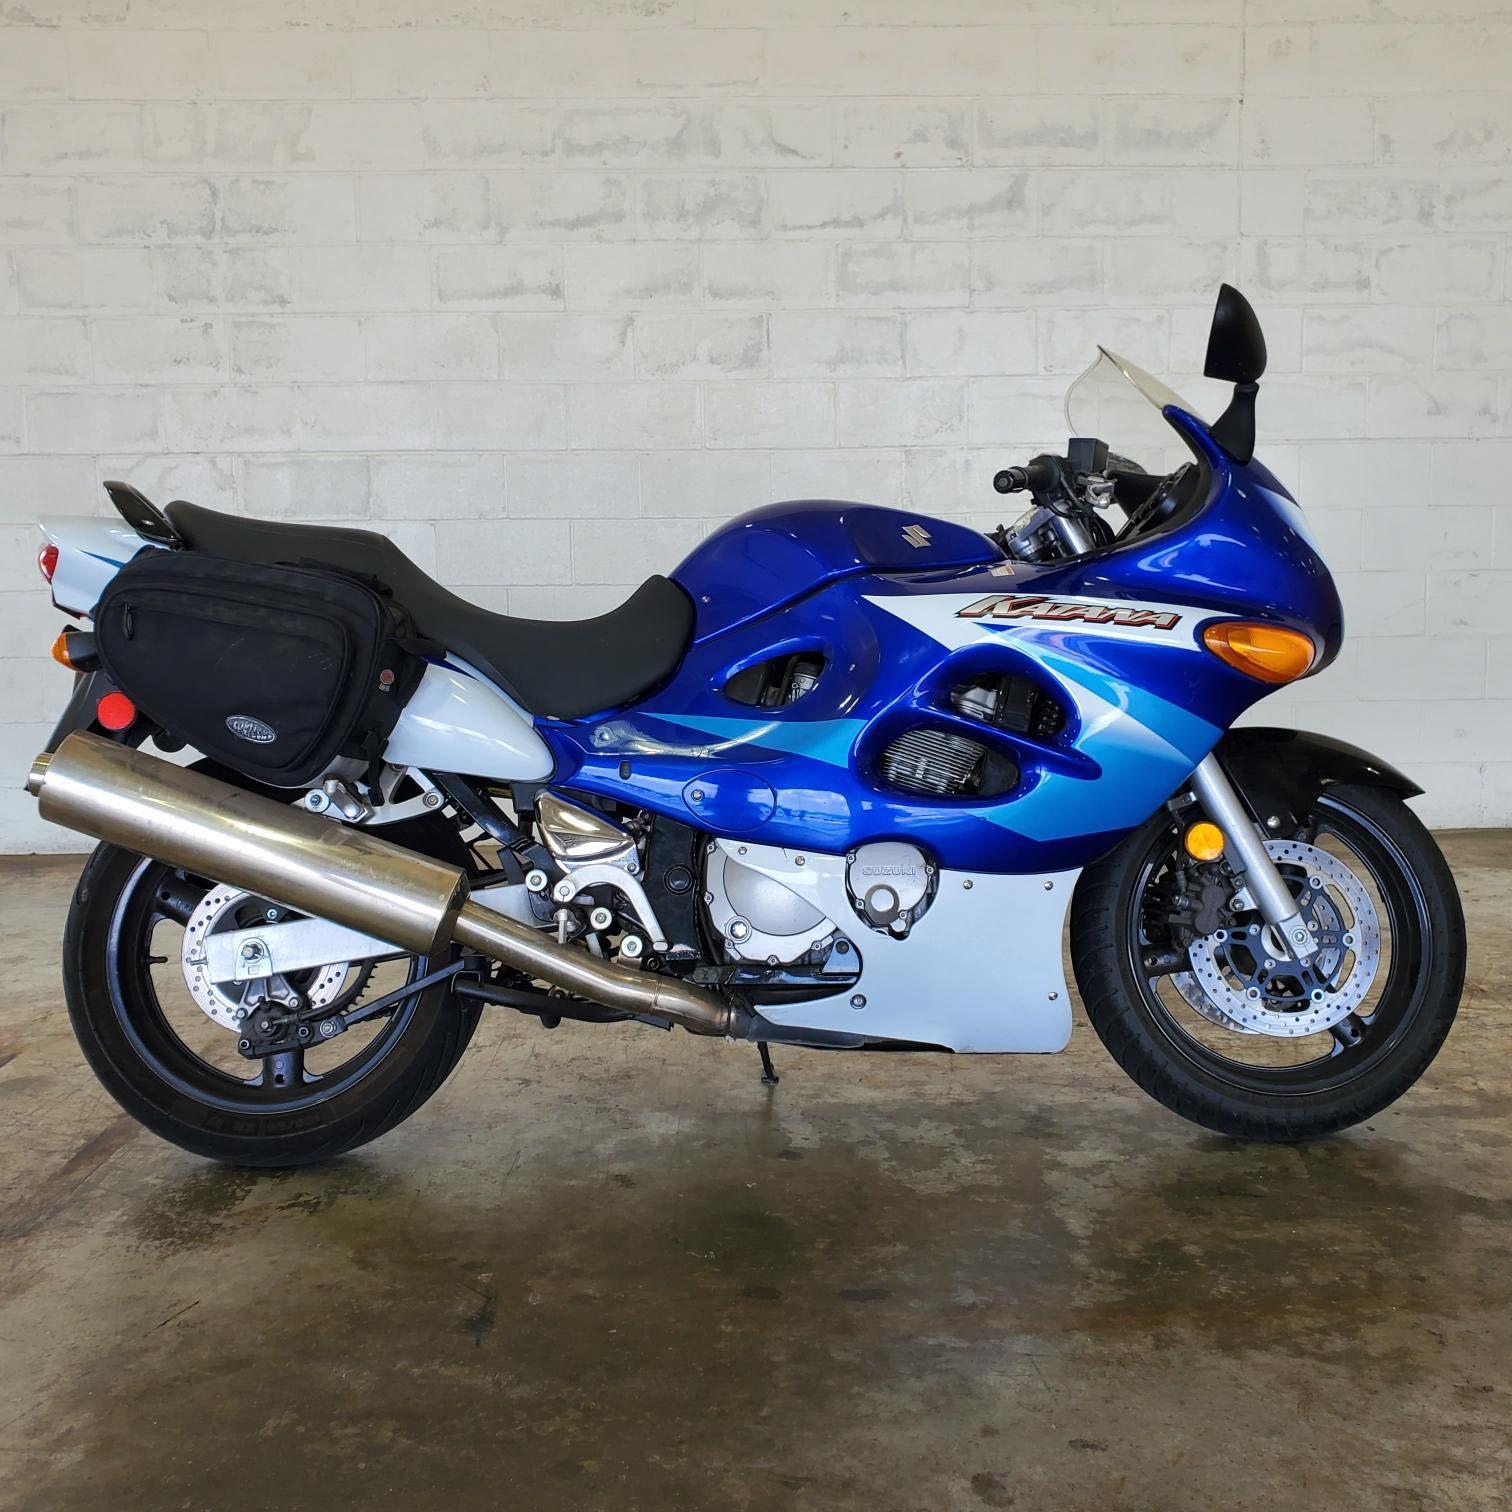 2005 Suzuki Katana 600 at Twisted Cycles